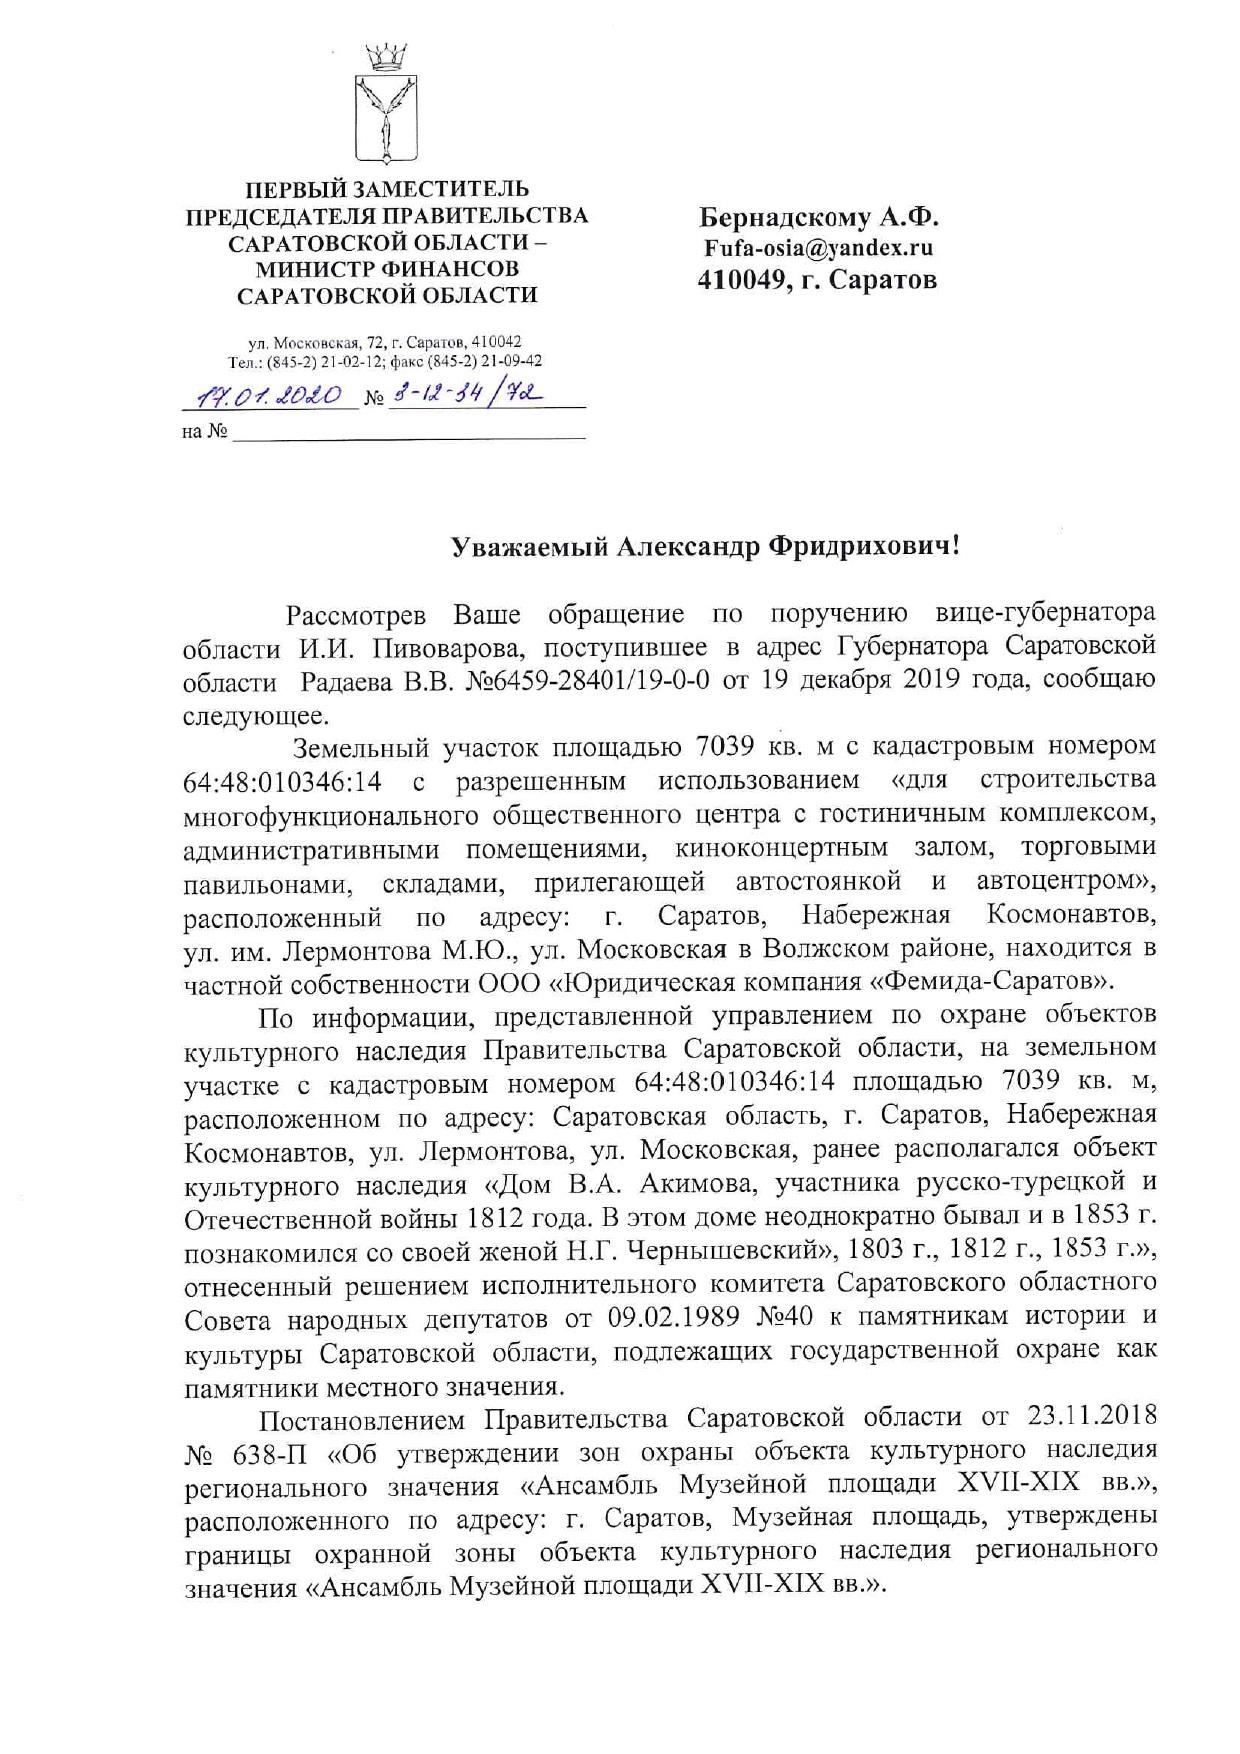 Бернадскому А.Ф. 3-12-34-72 от 17.01.2020_page-0001